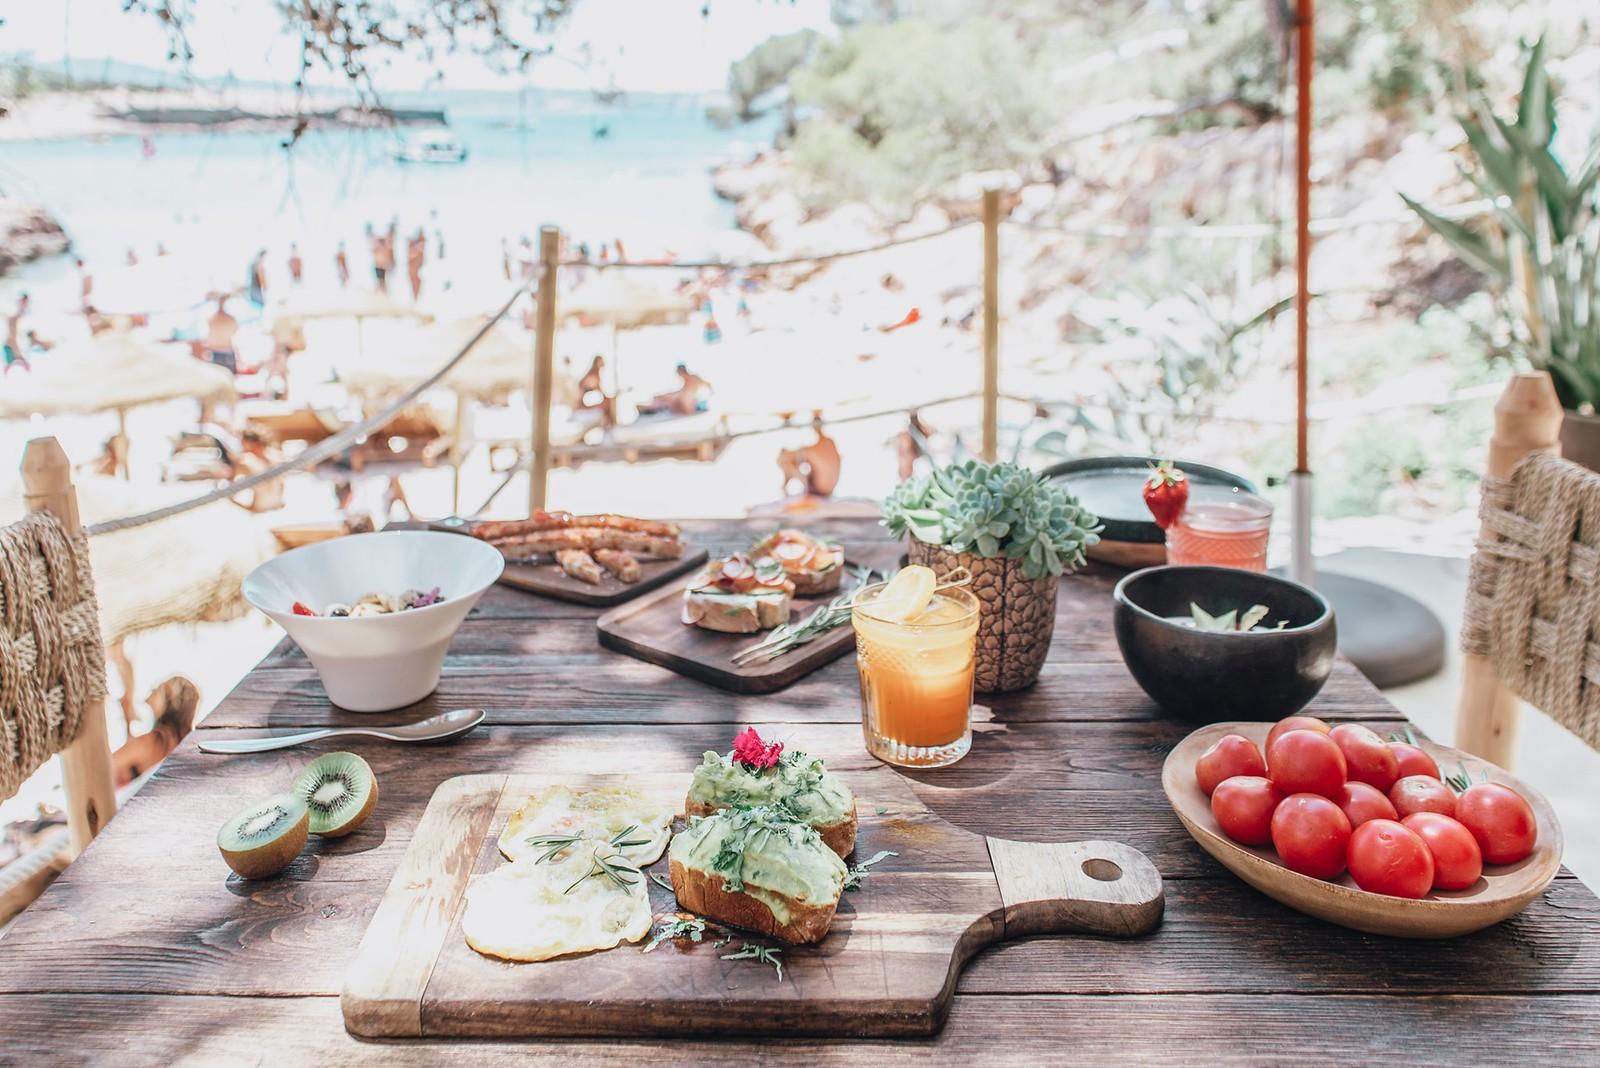 https://www.white-ibiza.com/wp-content/uploads/2020/09/white-ibiza-beach-restaurants-cala-gracioneta-chiringuito-02.jpg